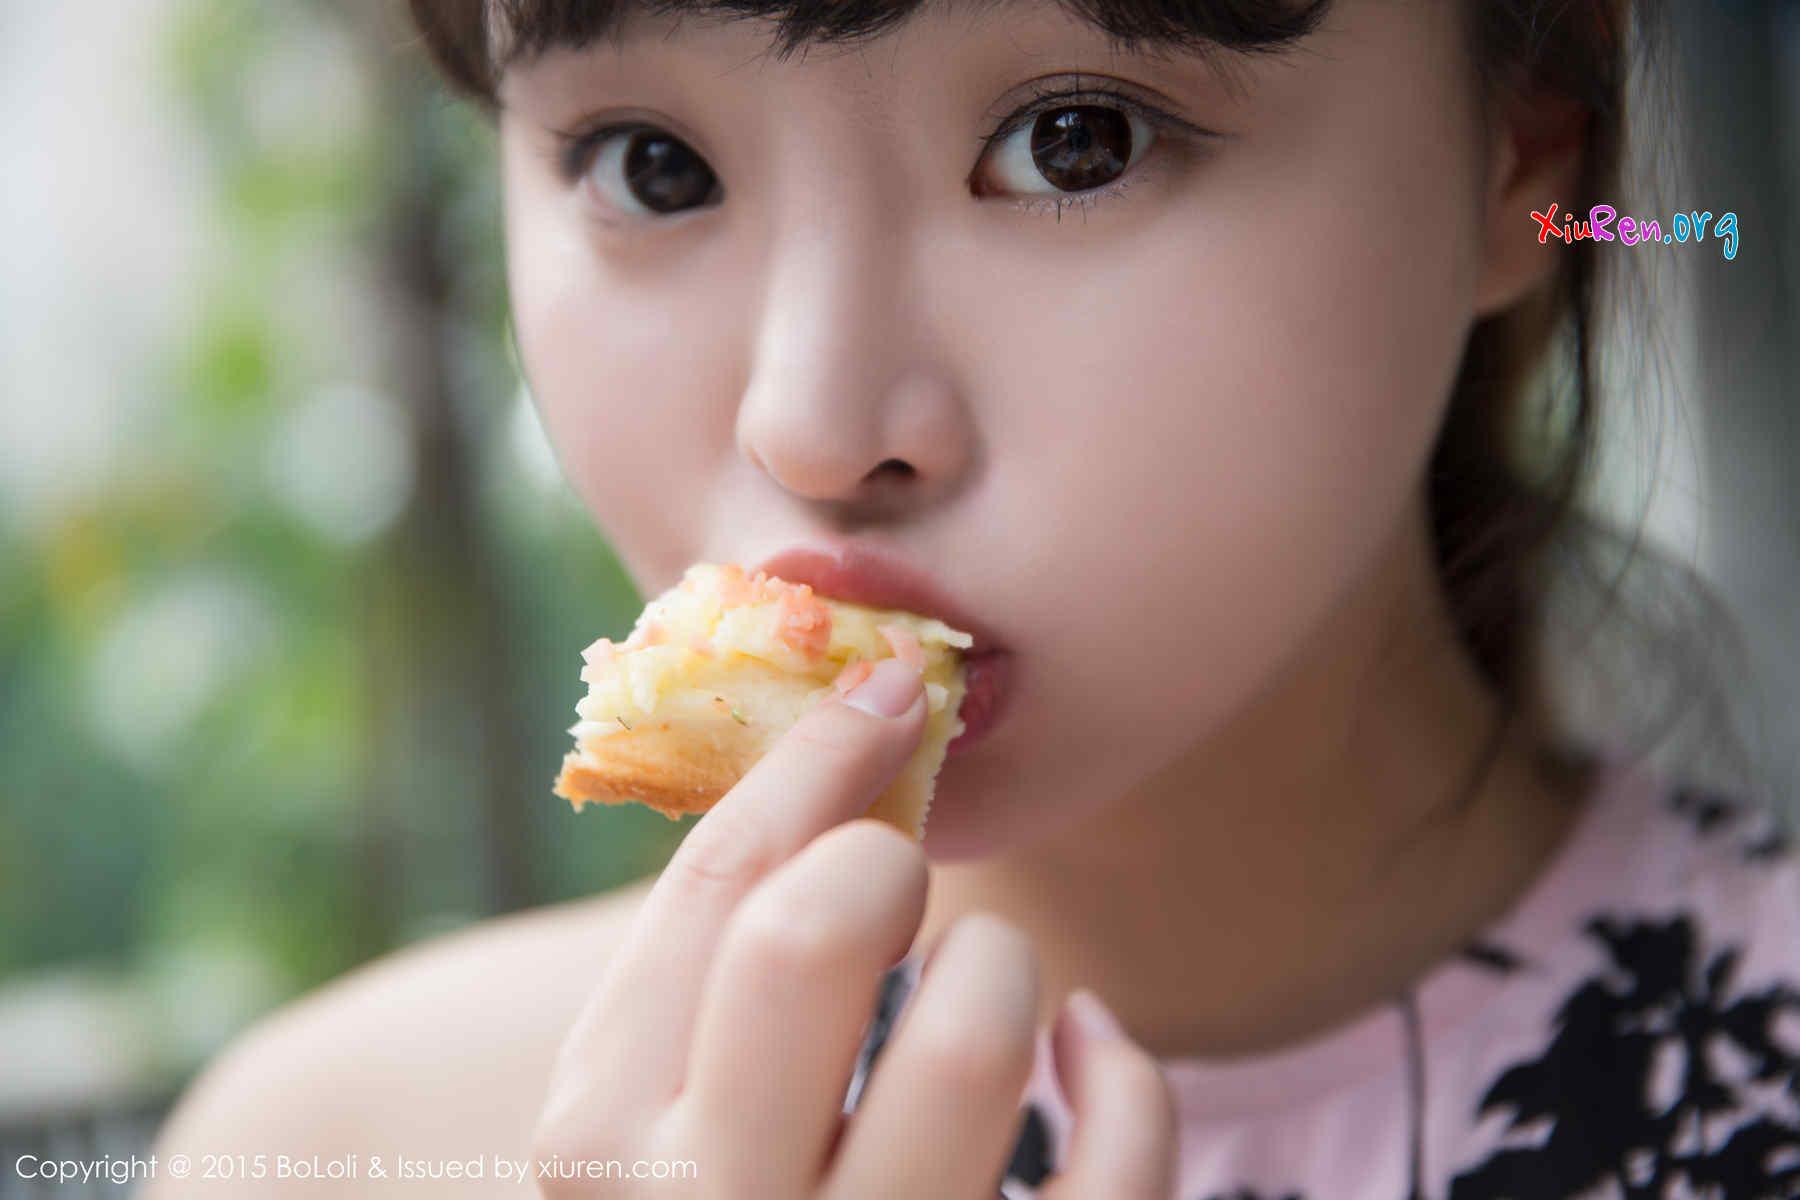 PhimVu-Blog-0068.jpg